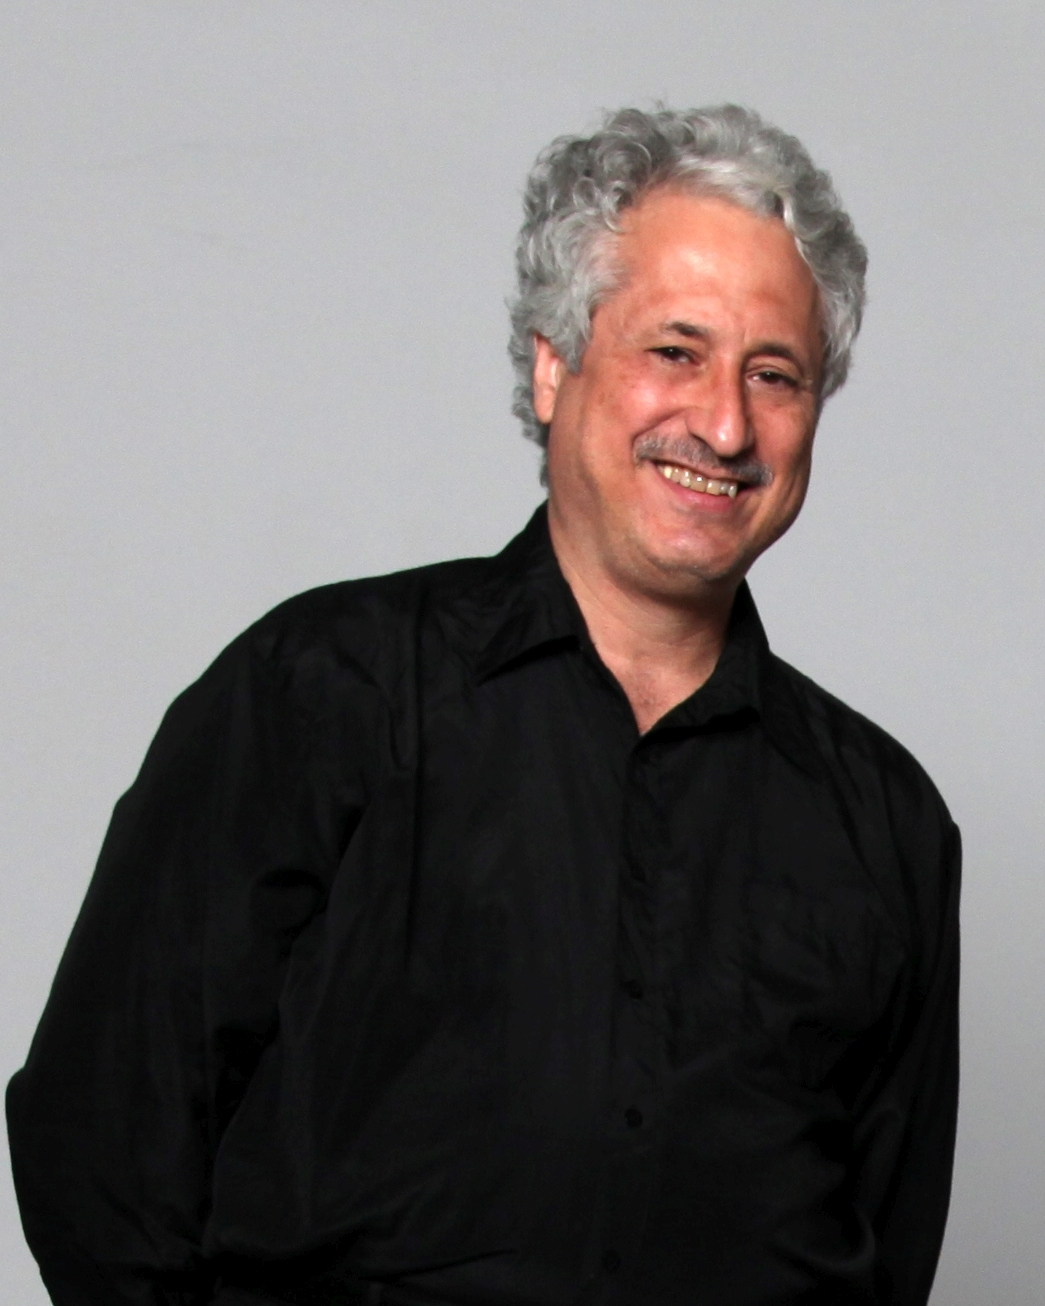 Jeff Adler, bass clarinet